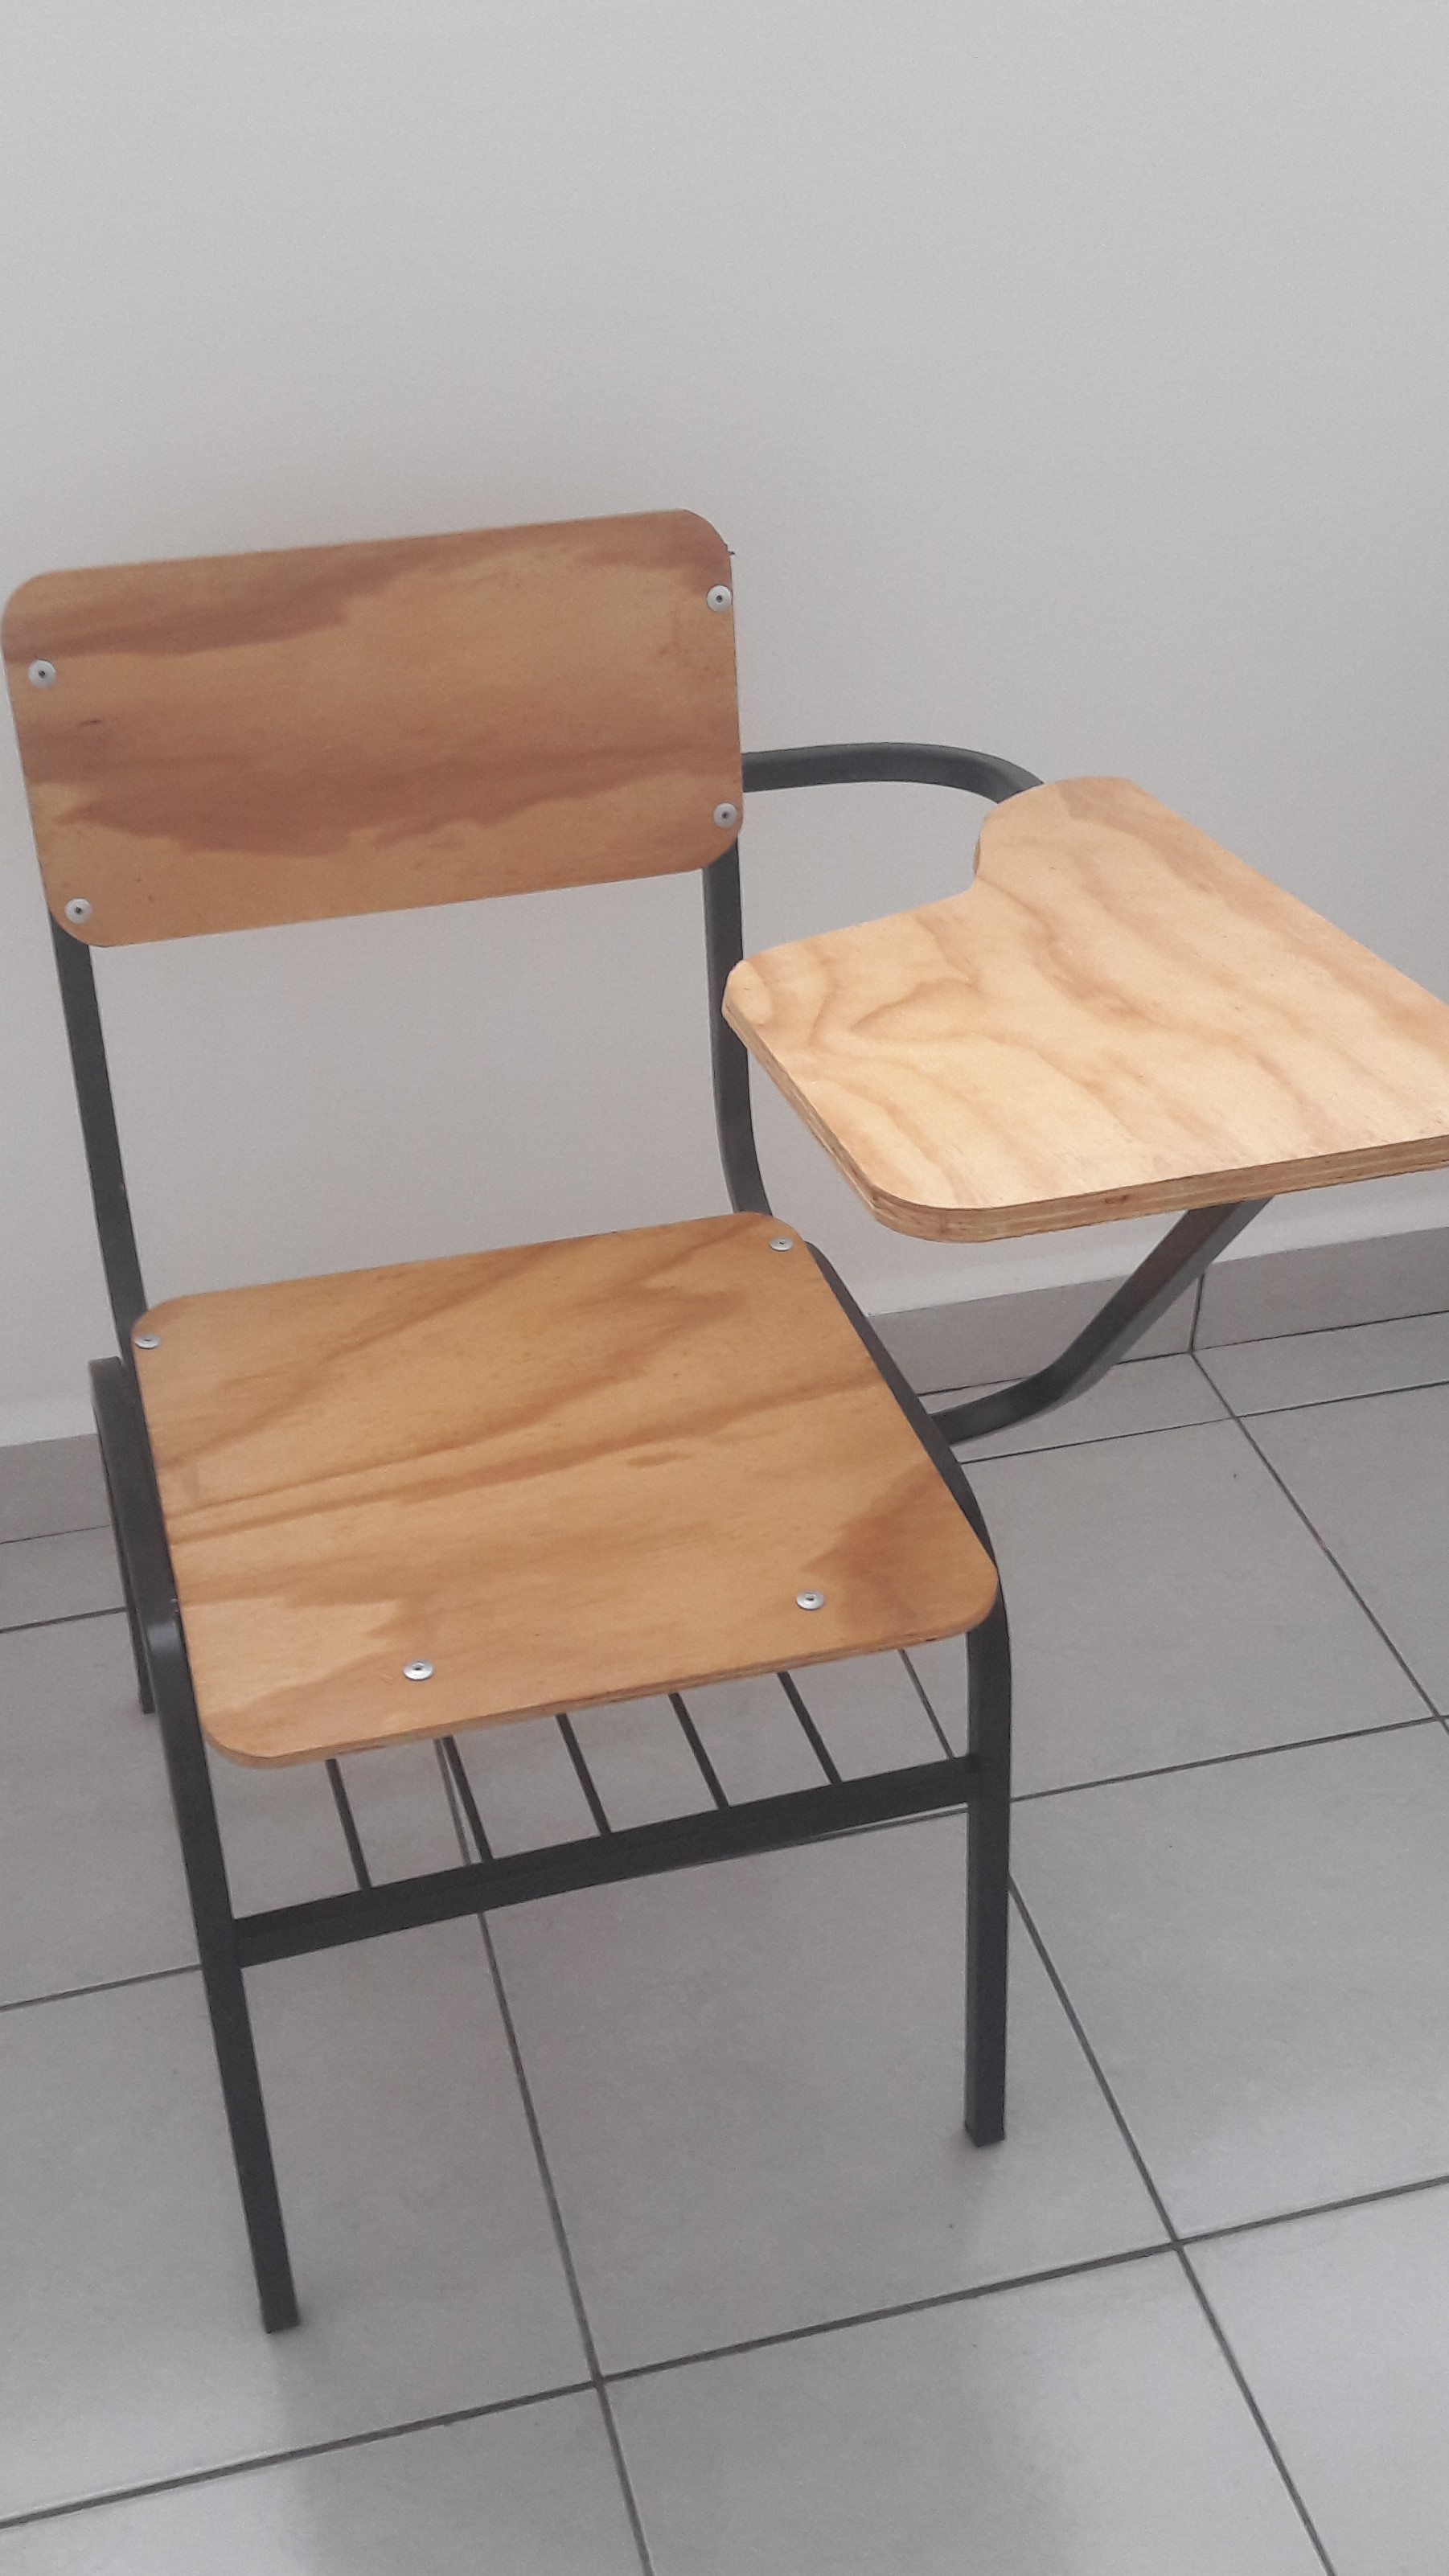 Lote 015 8 sillas para zurdos con entrepa o subastas en for Sillas para zurdos